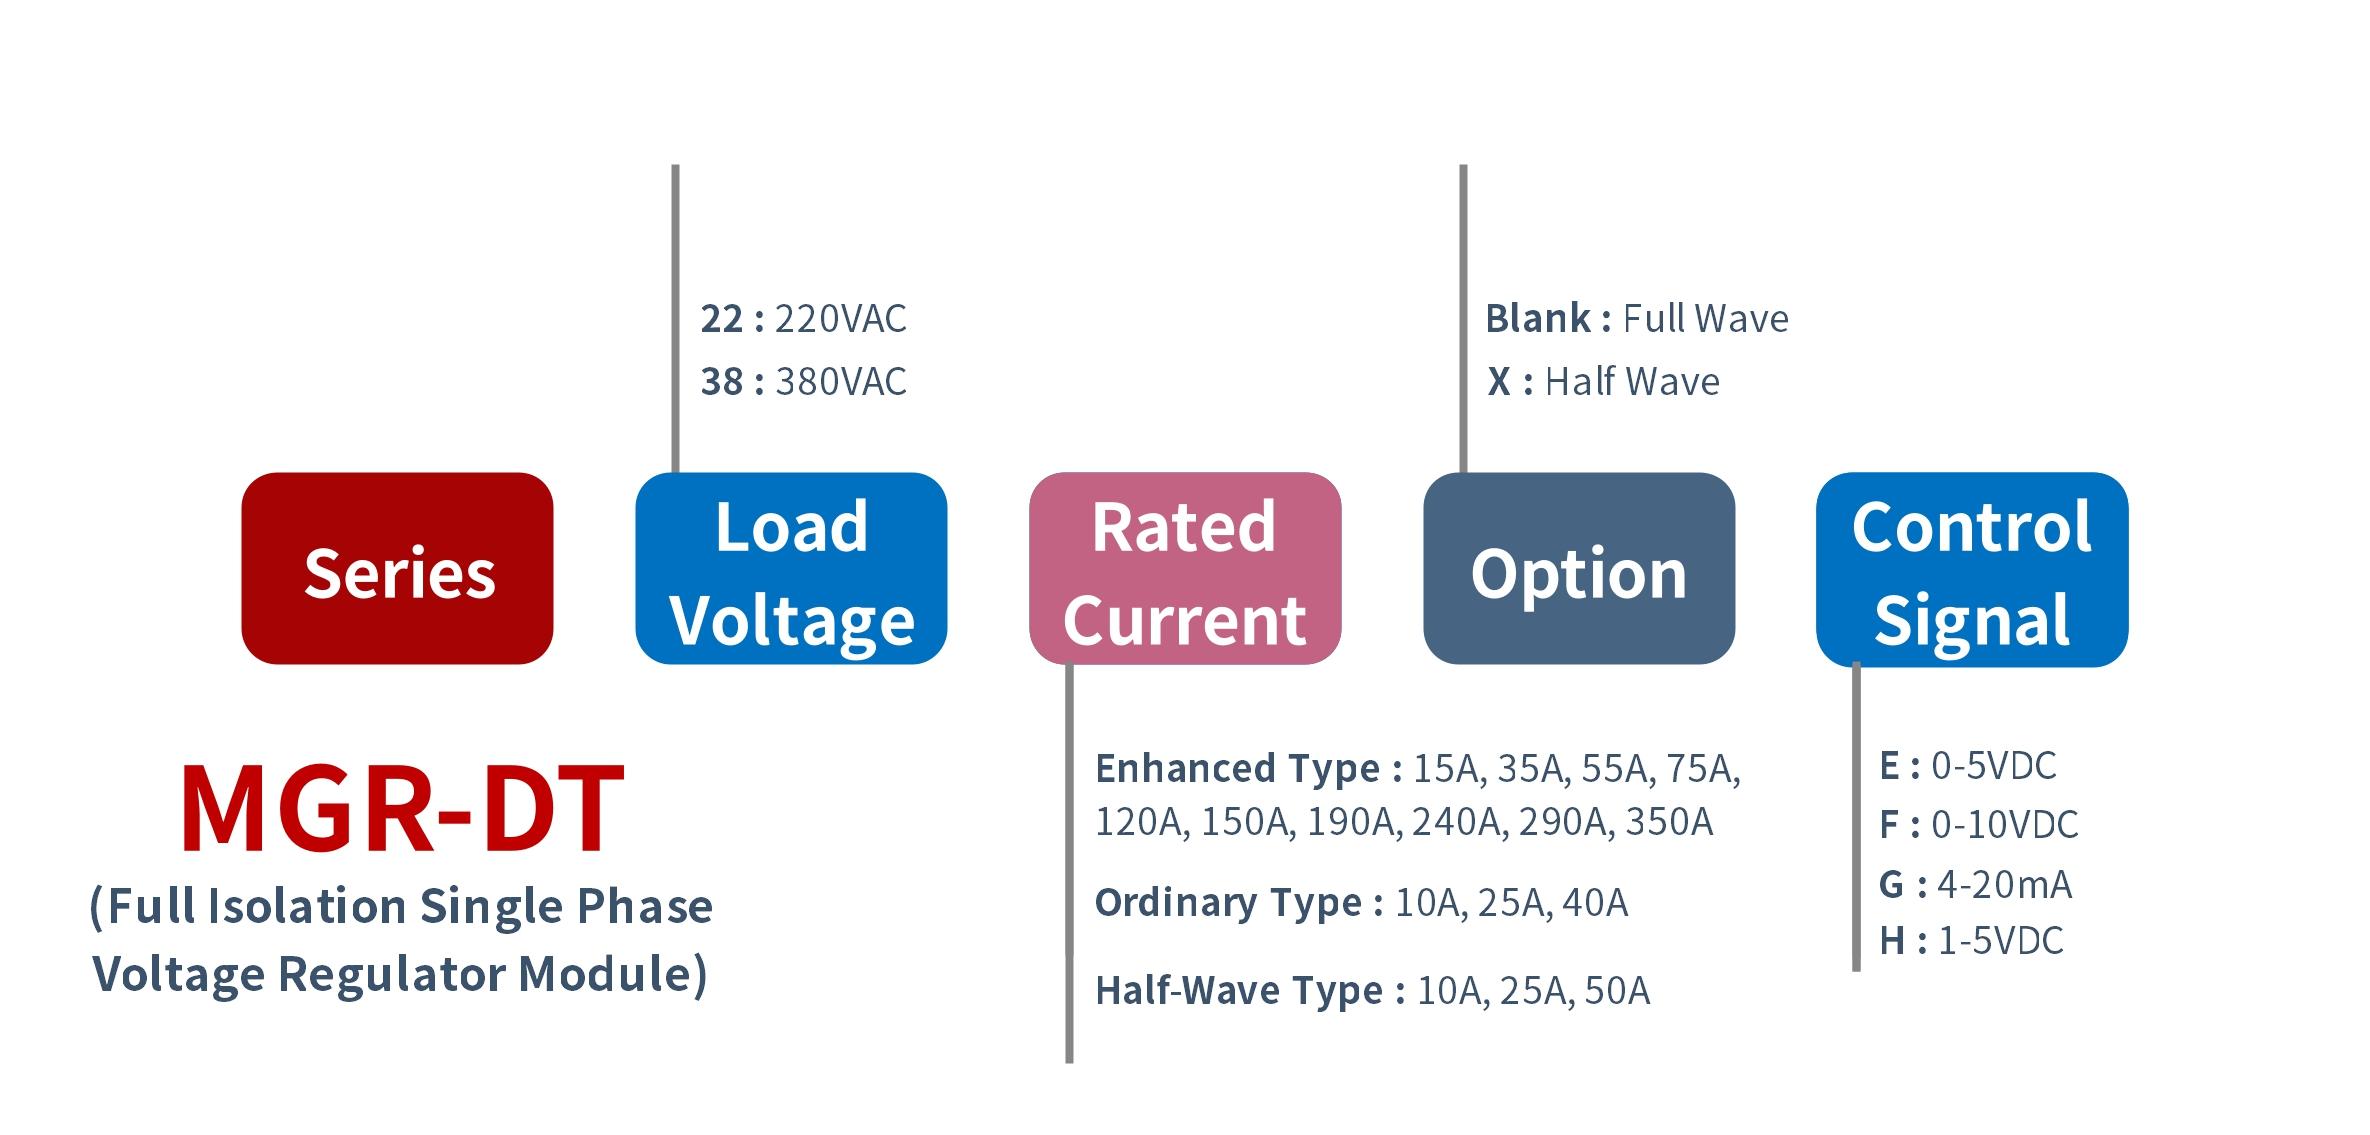 How to order MGR-DT Series Voltage Power Regulator